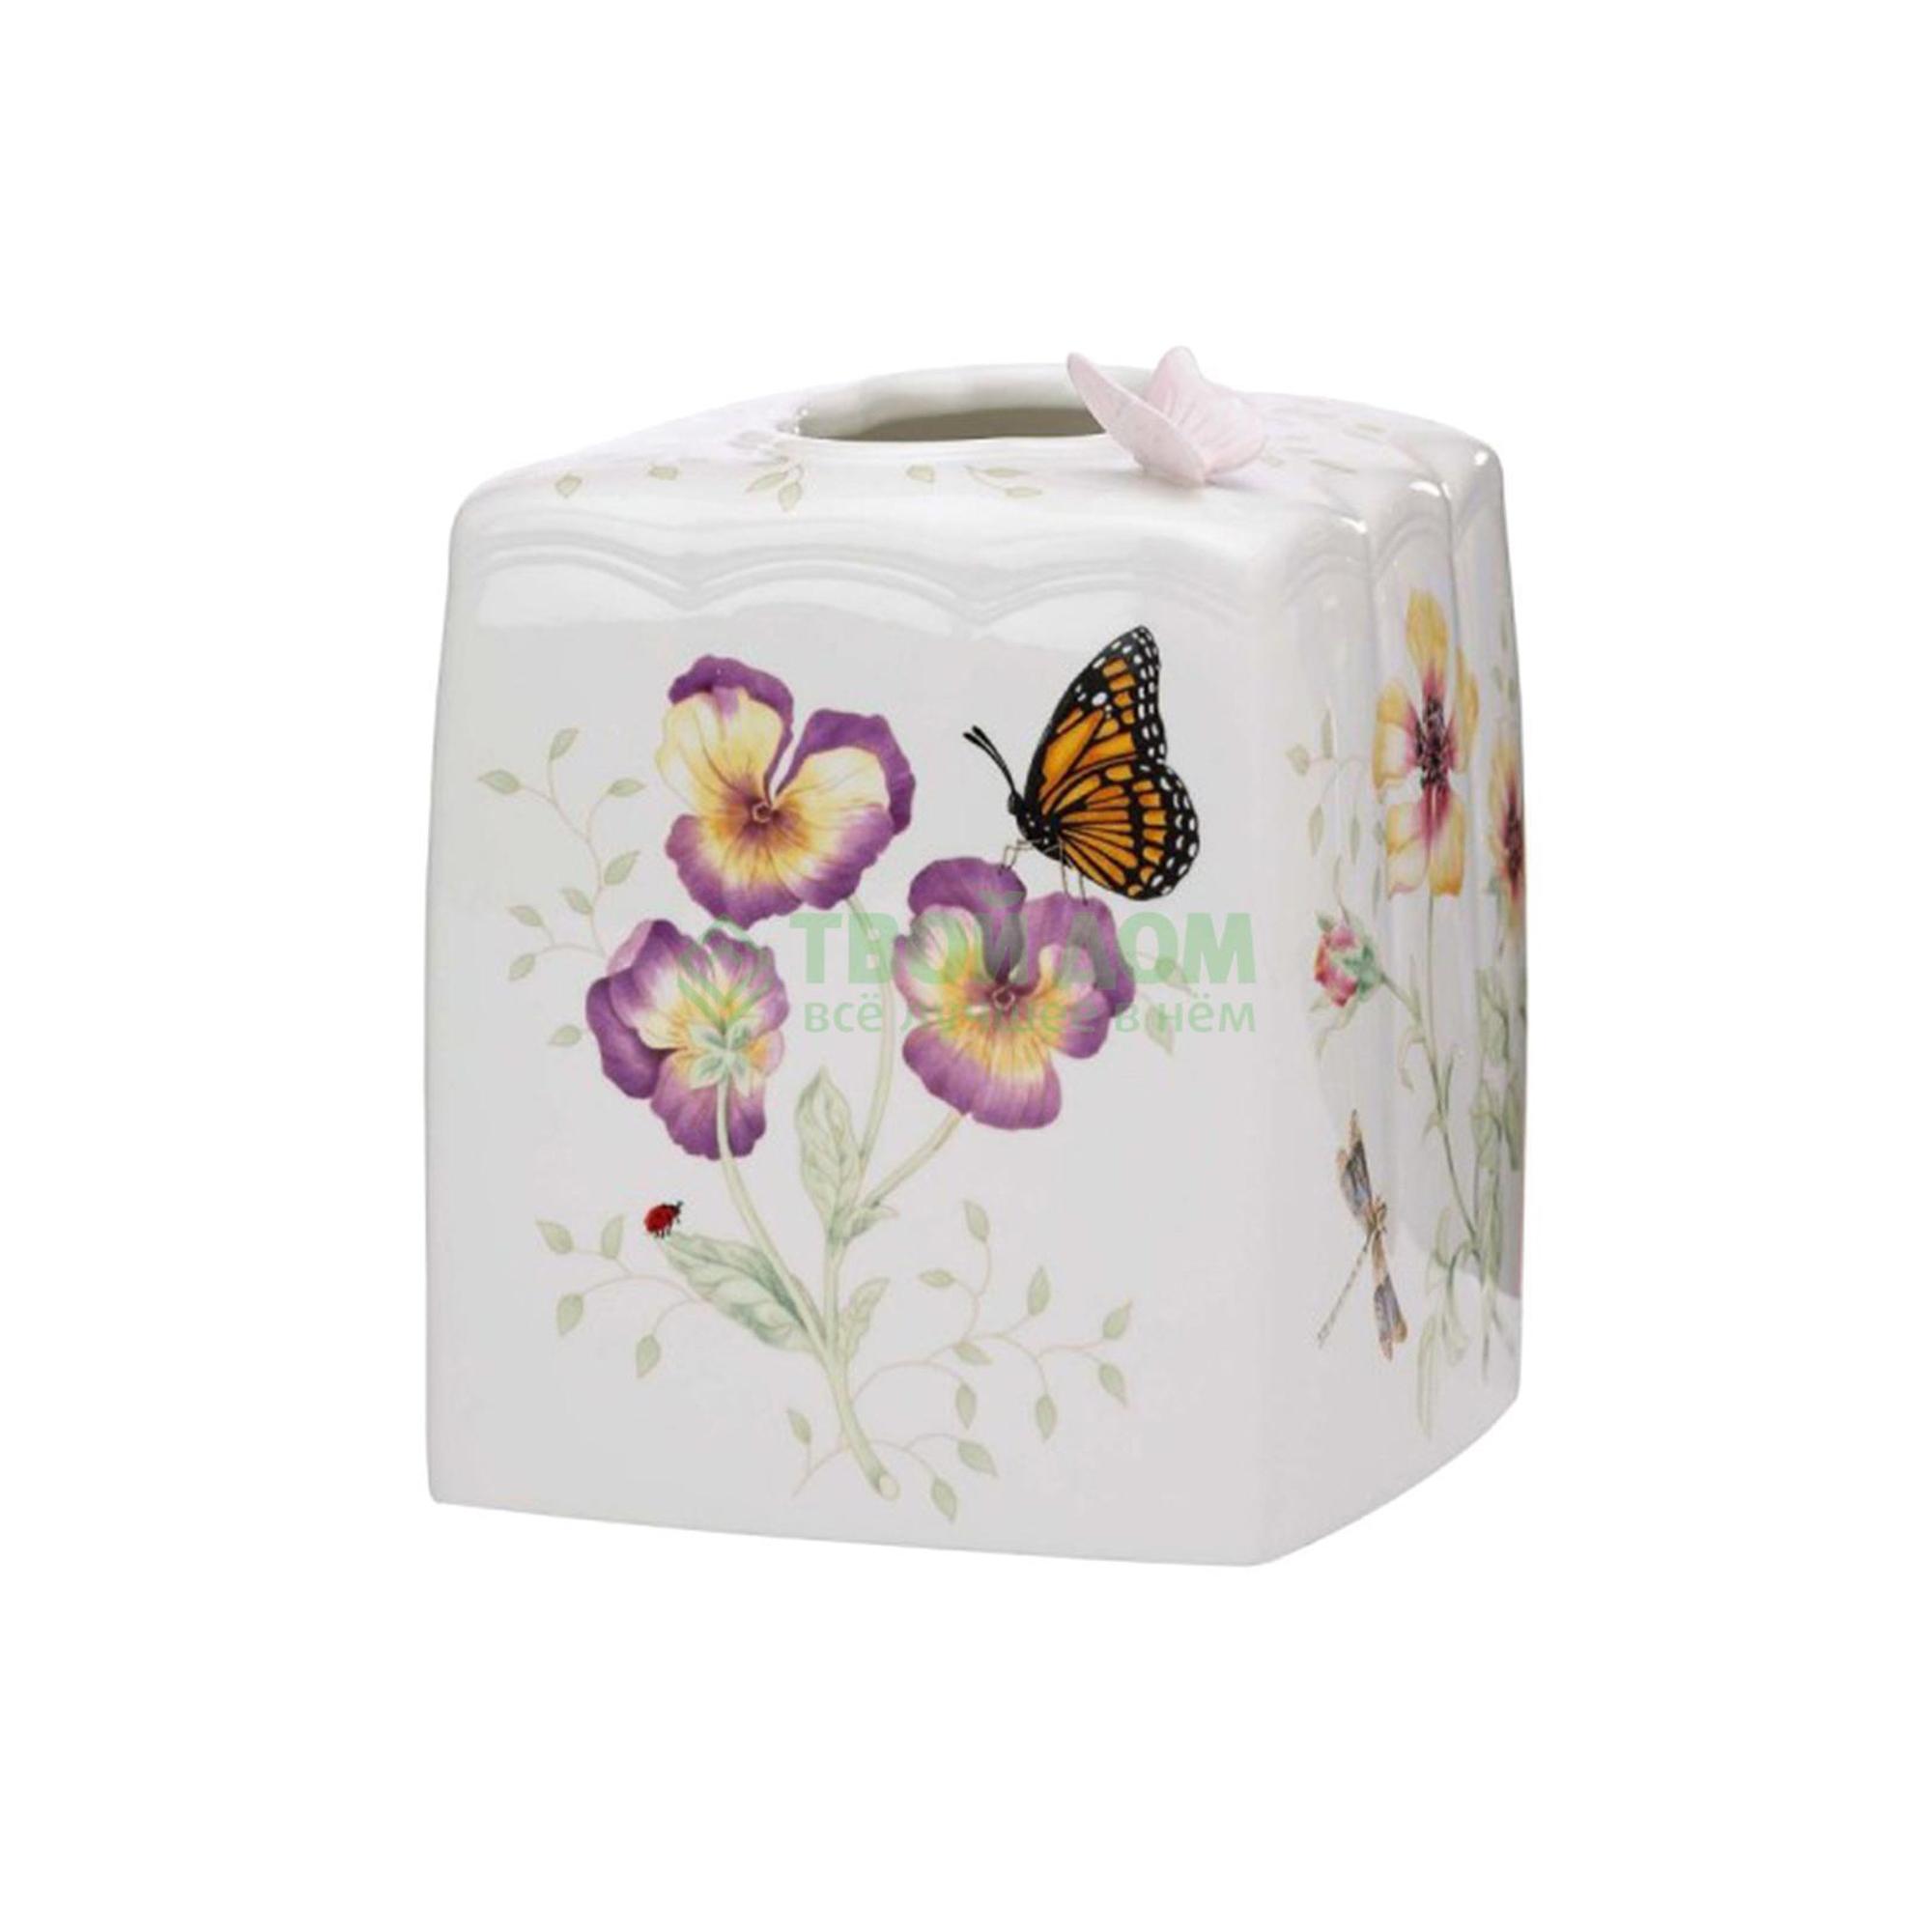 Держатель для салфеток Lenox подставка для салфеток 15 см бабочки на лугу (LEN773909)